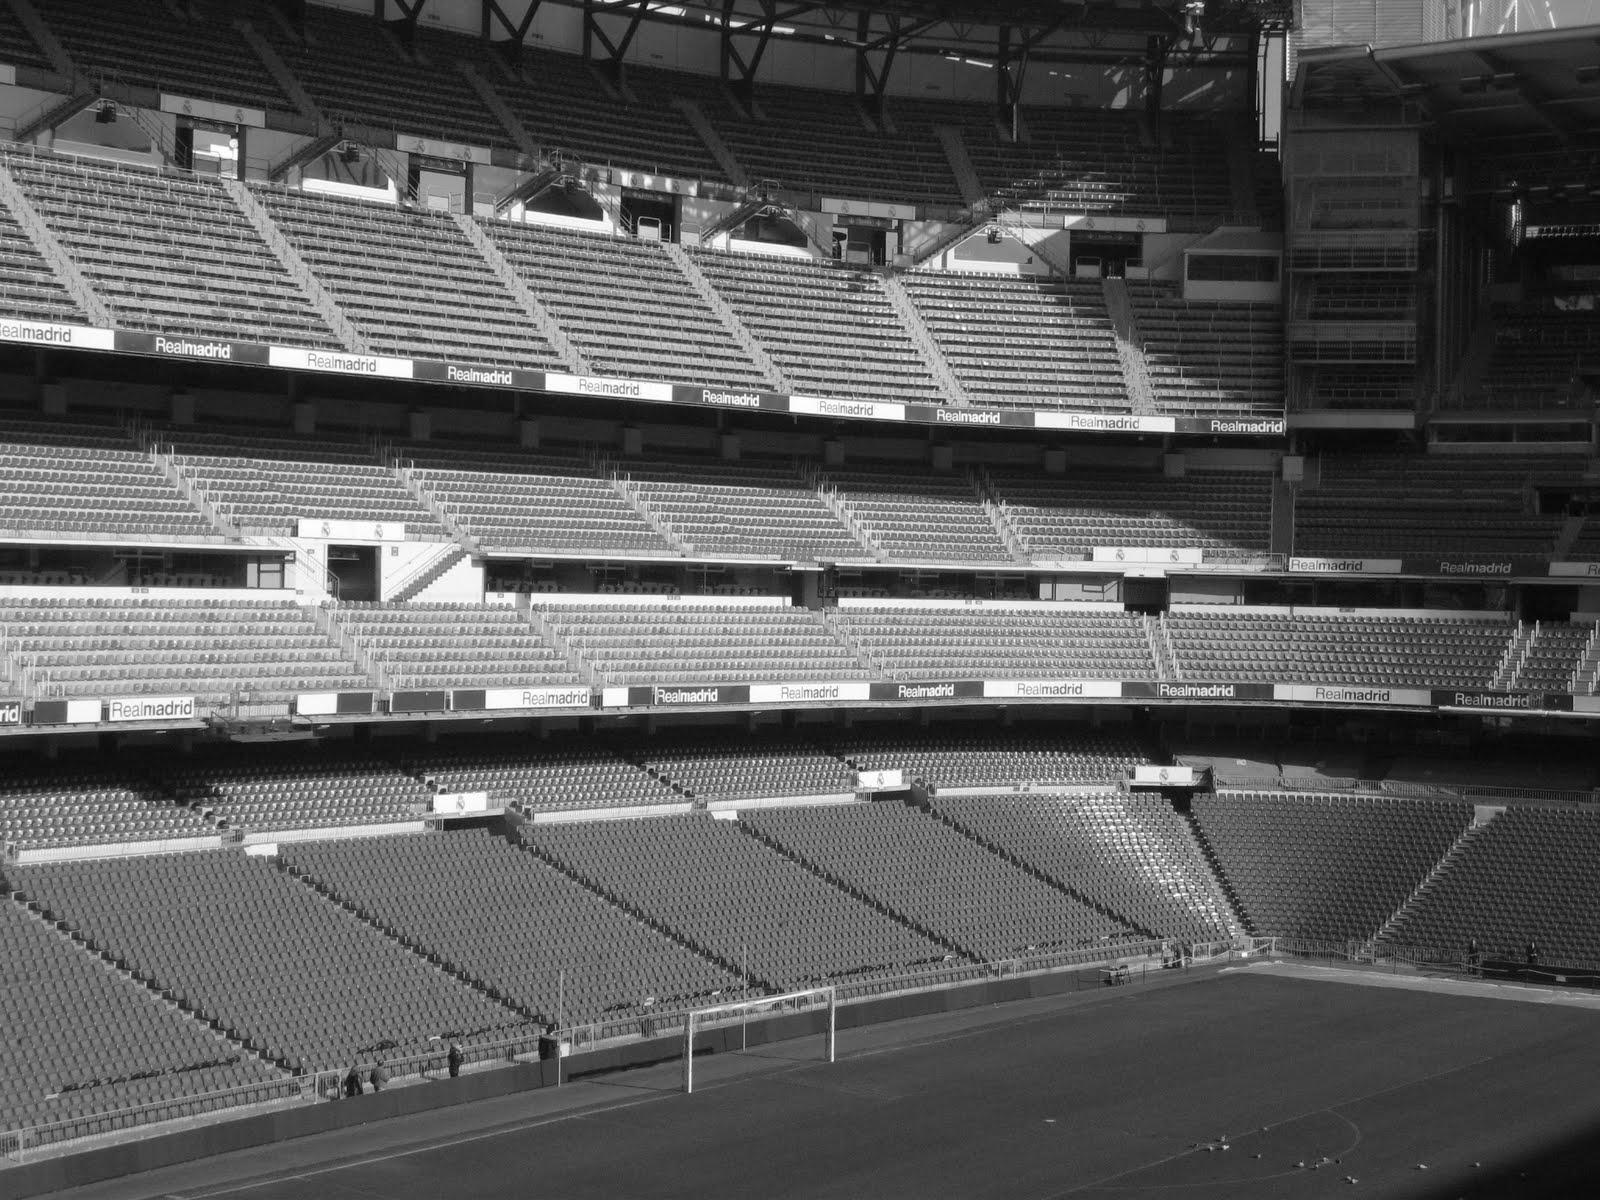 Est dio 11 est dio santiago bernab u for Estadio bernabeu puerta 0